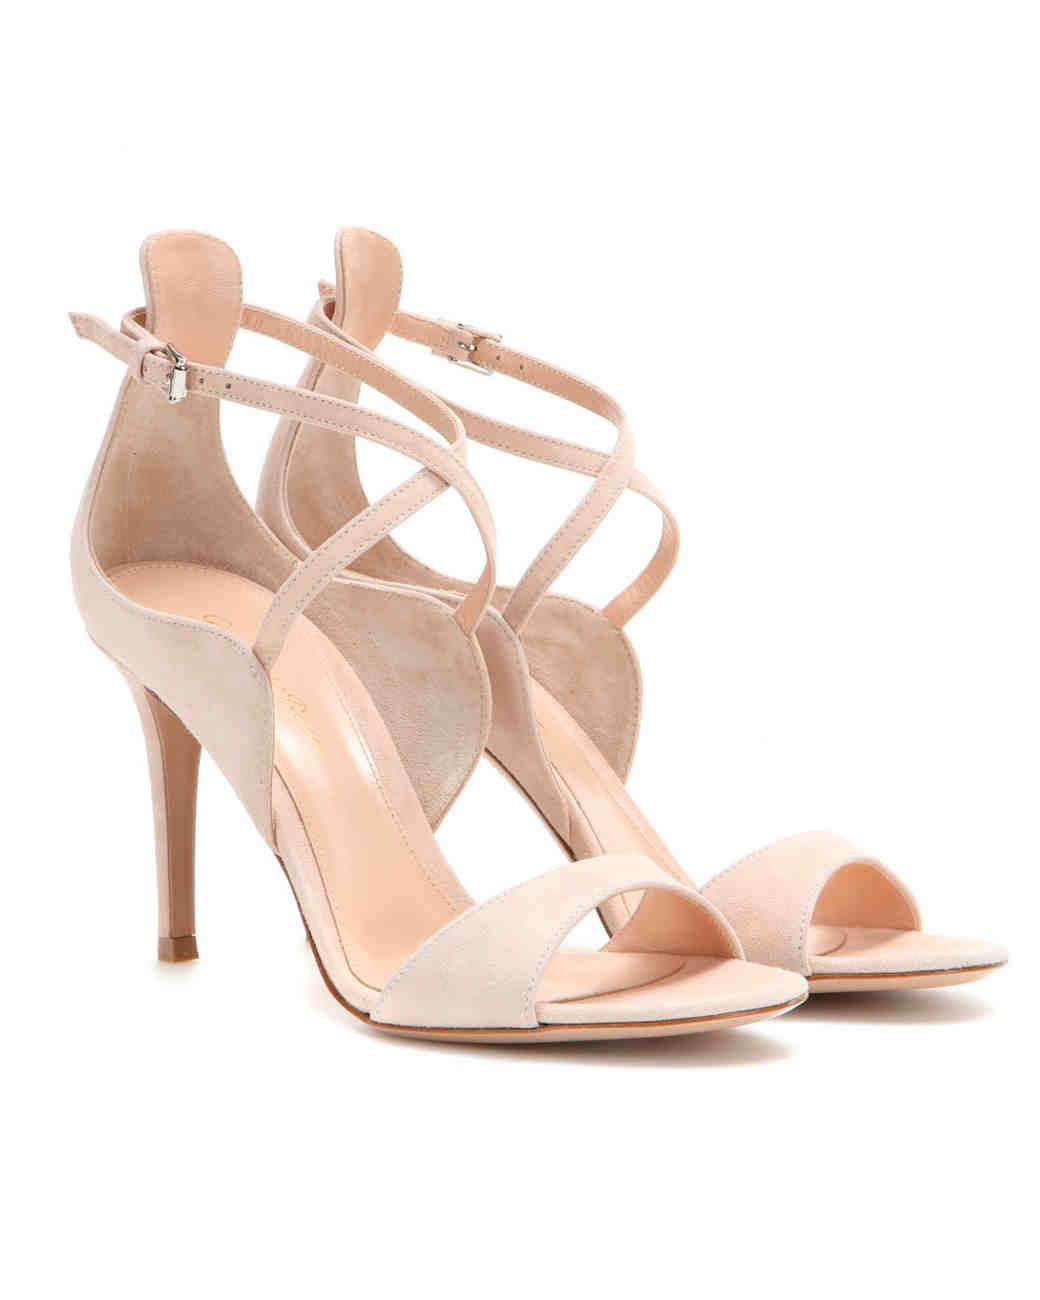 summer-wedding-shoes-gianvito-rossi-suede-sandals-0515.jpg